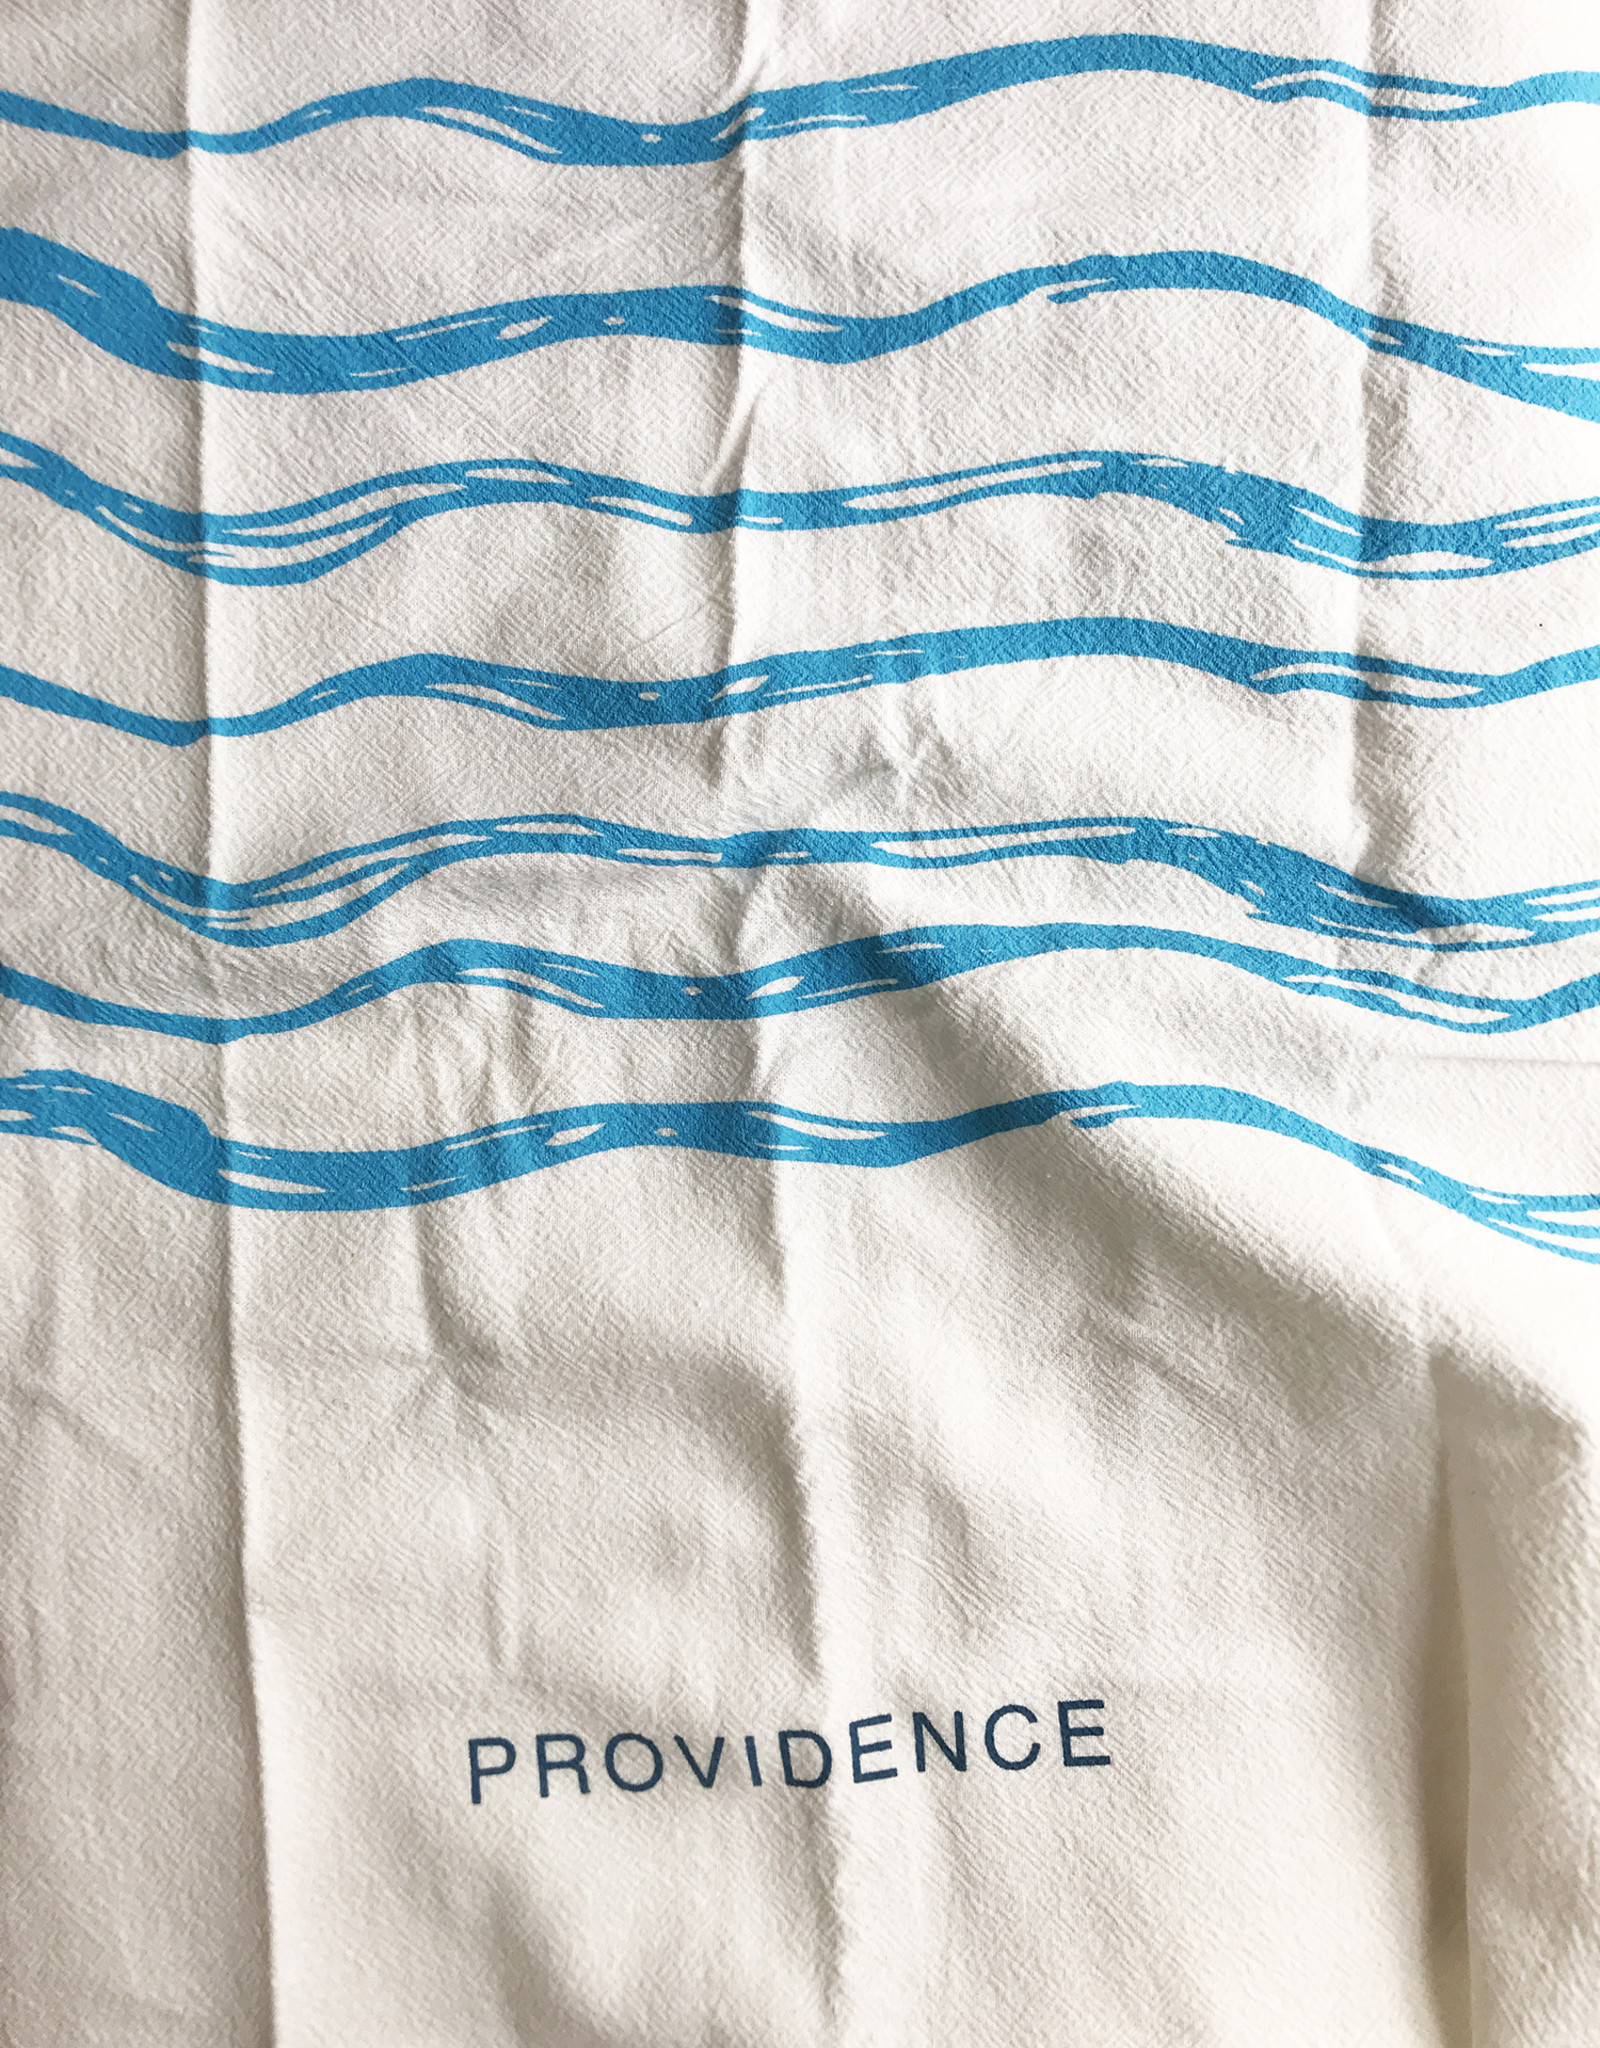 Stock Providence Rhode Island Made in RI Ocean State Flour Sack Tea Towels